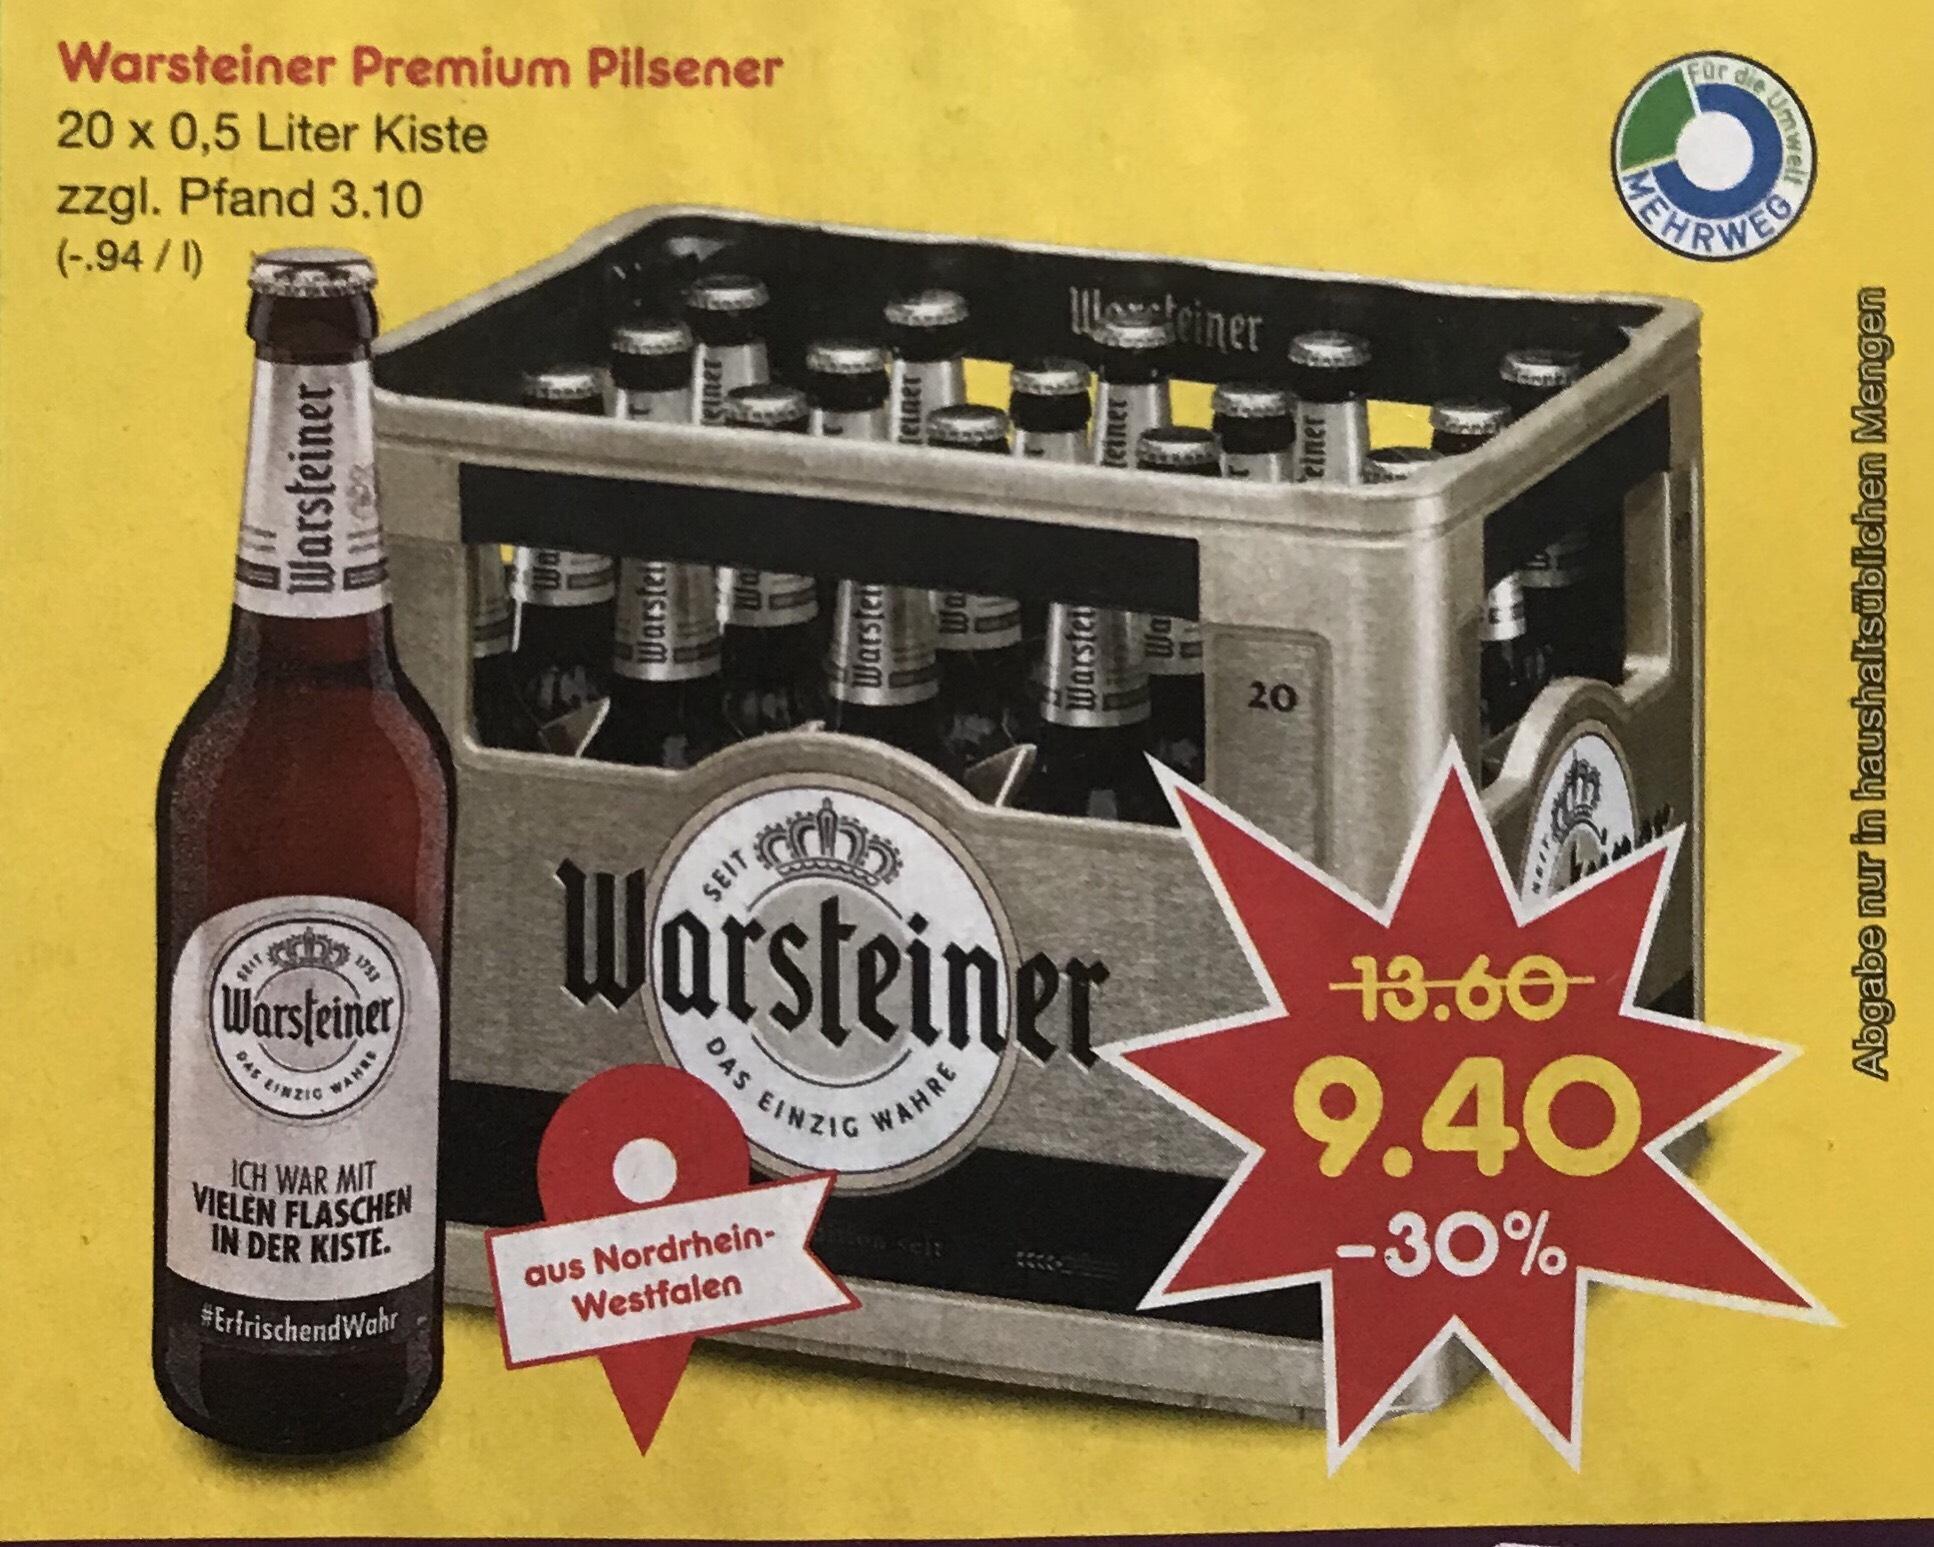 [Lokal Düsseldorf] Warsteiner Premium Pilsener (20x 0,5 Liter Kiste)